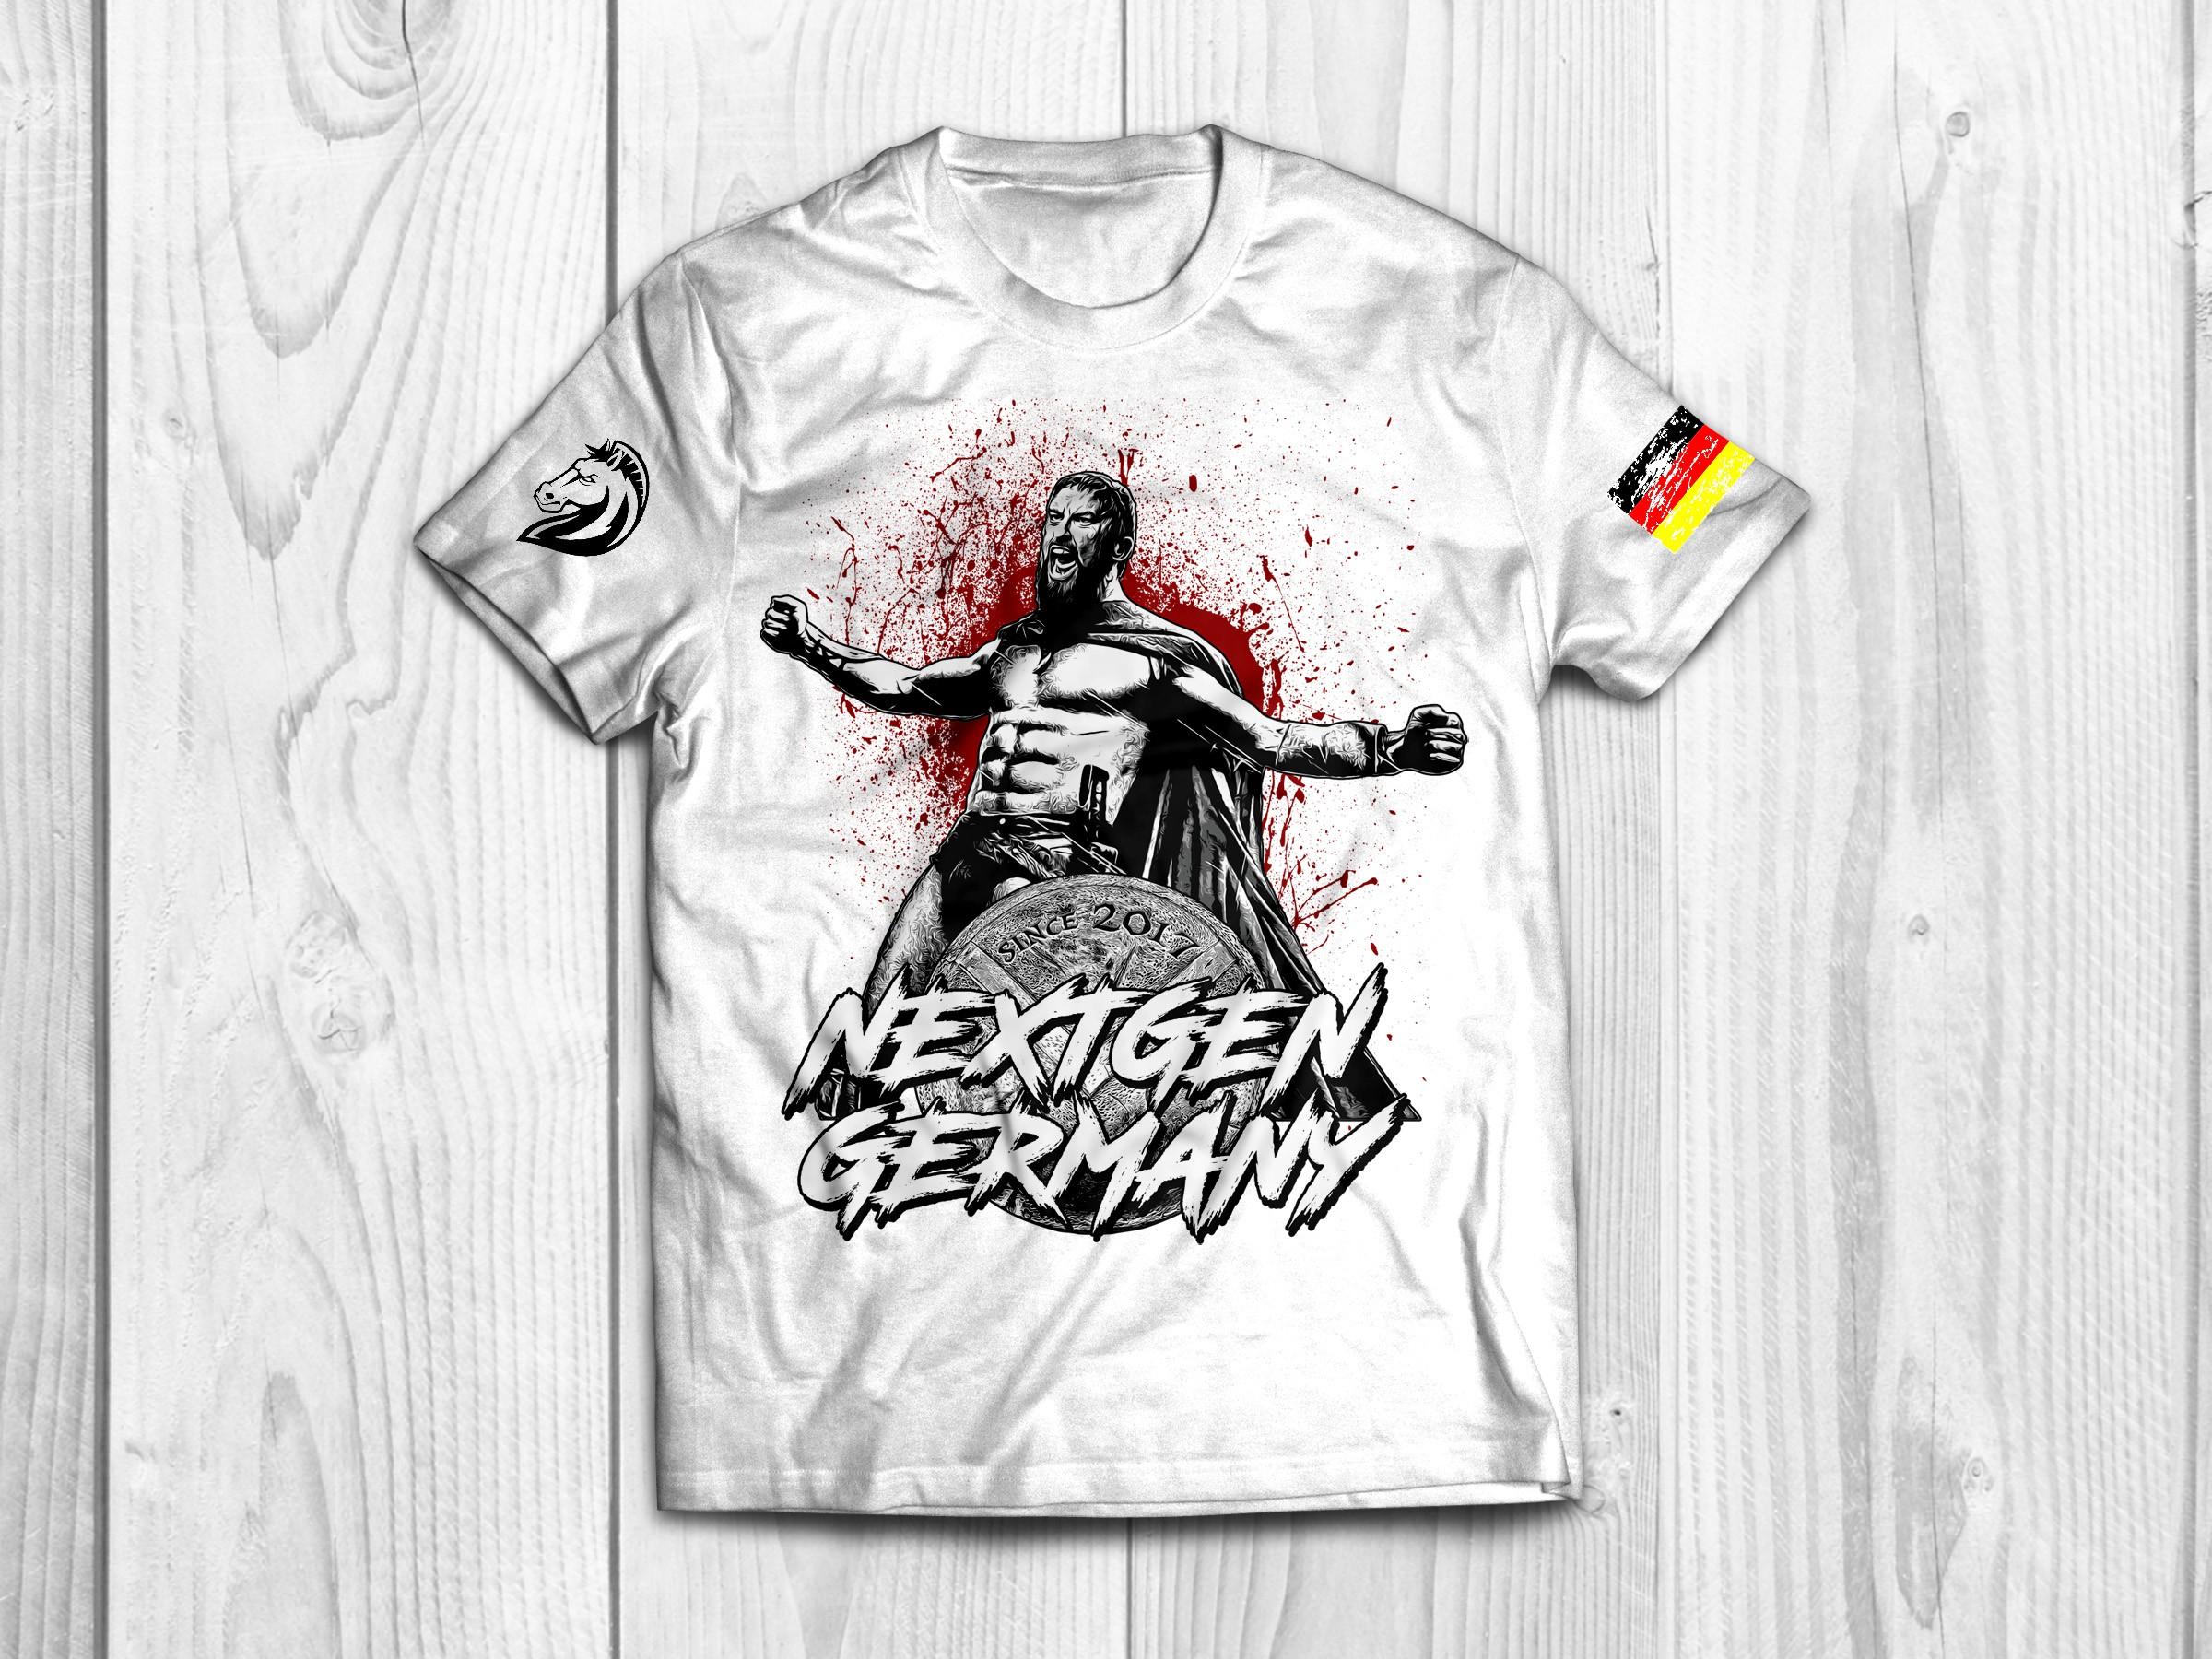 Warrior Logo NextGen Germany